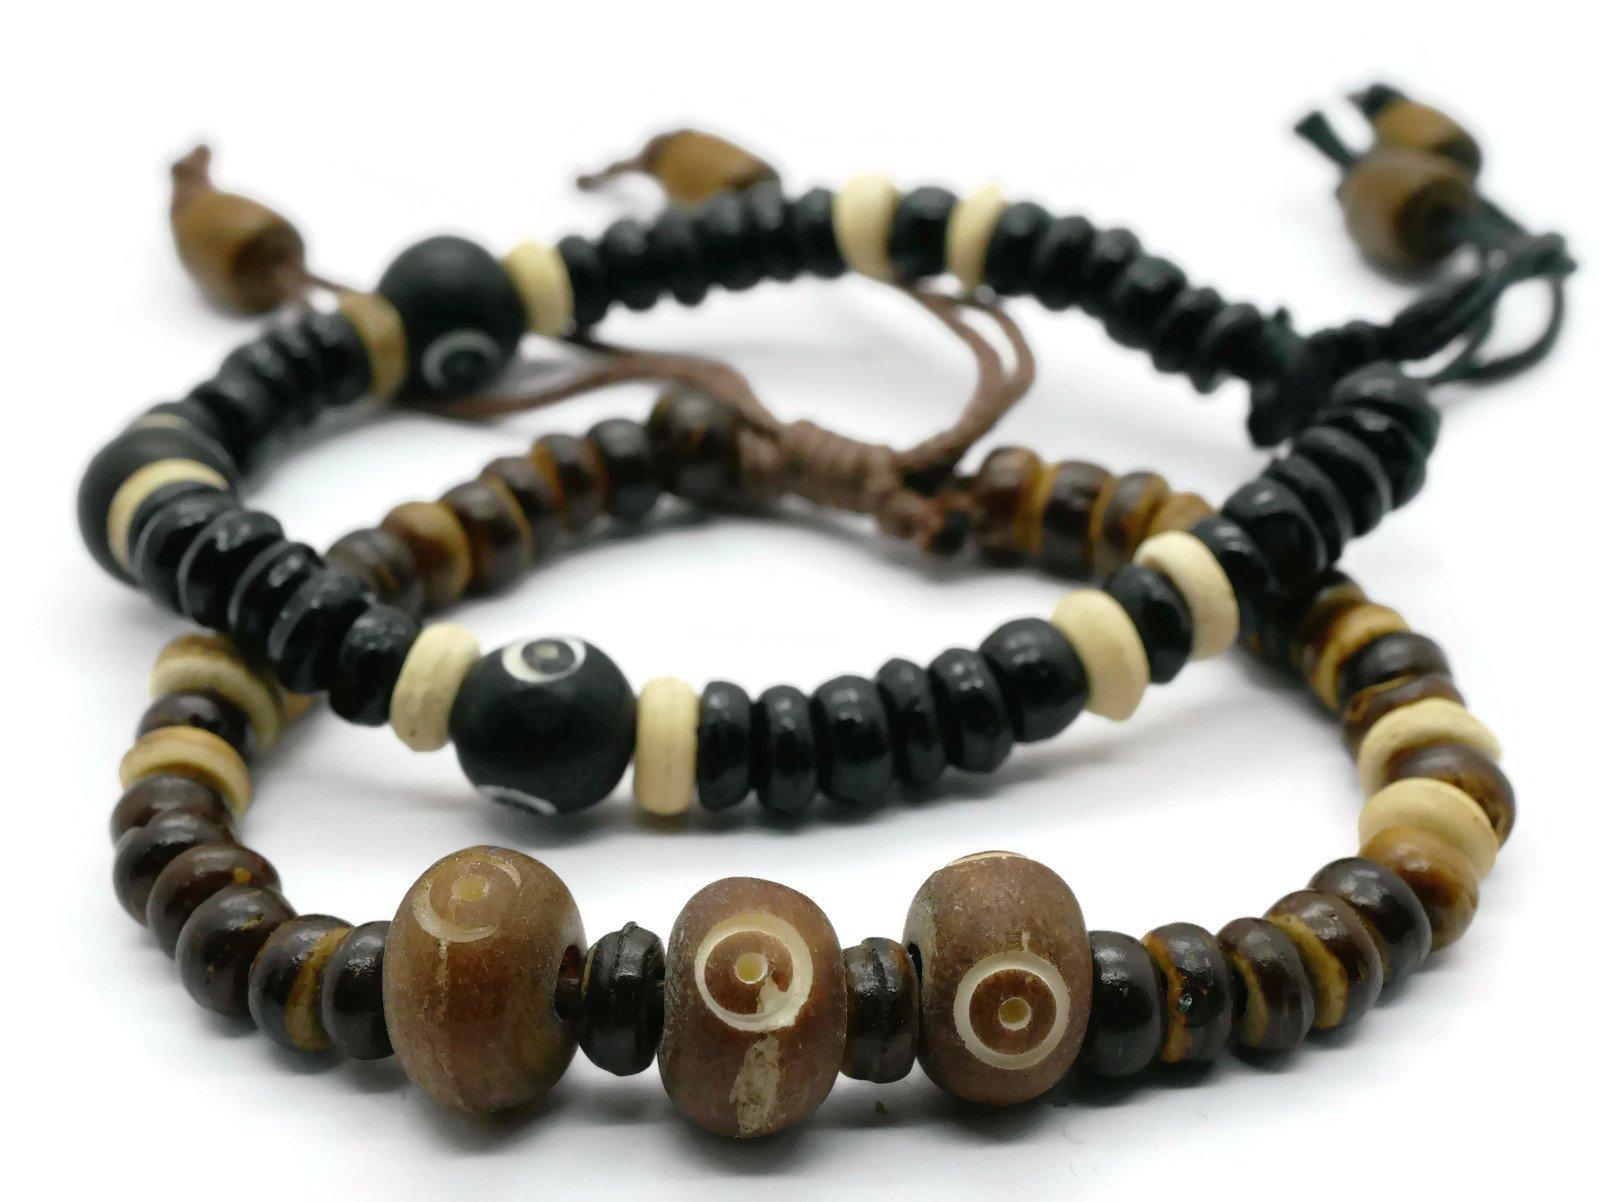 BrownBeans, Set of 2, Wood Beads Macrame Cord Women Mens Boys Sliding Knot Adjustable Bracelets (CBCT6005) (A01)